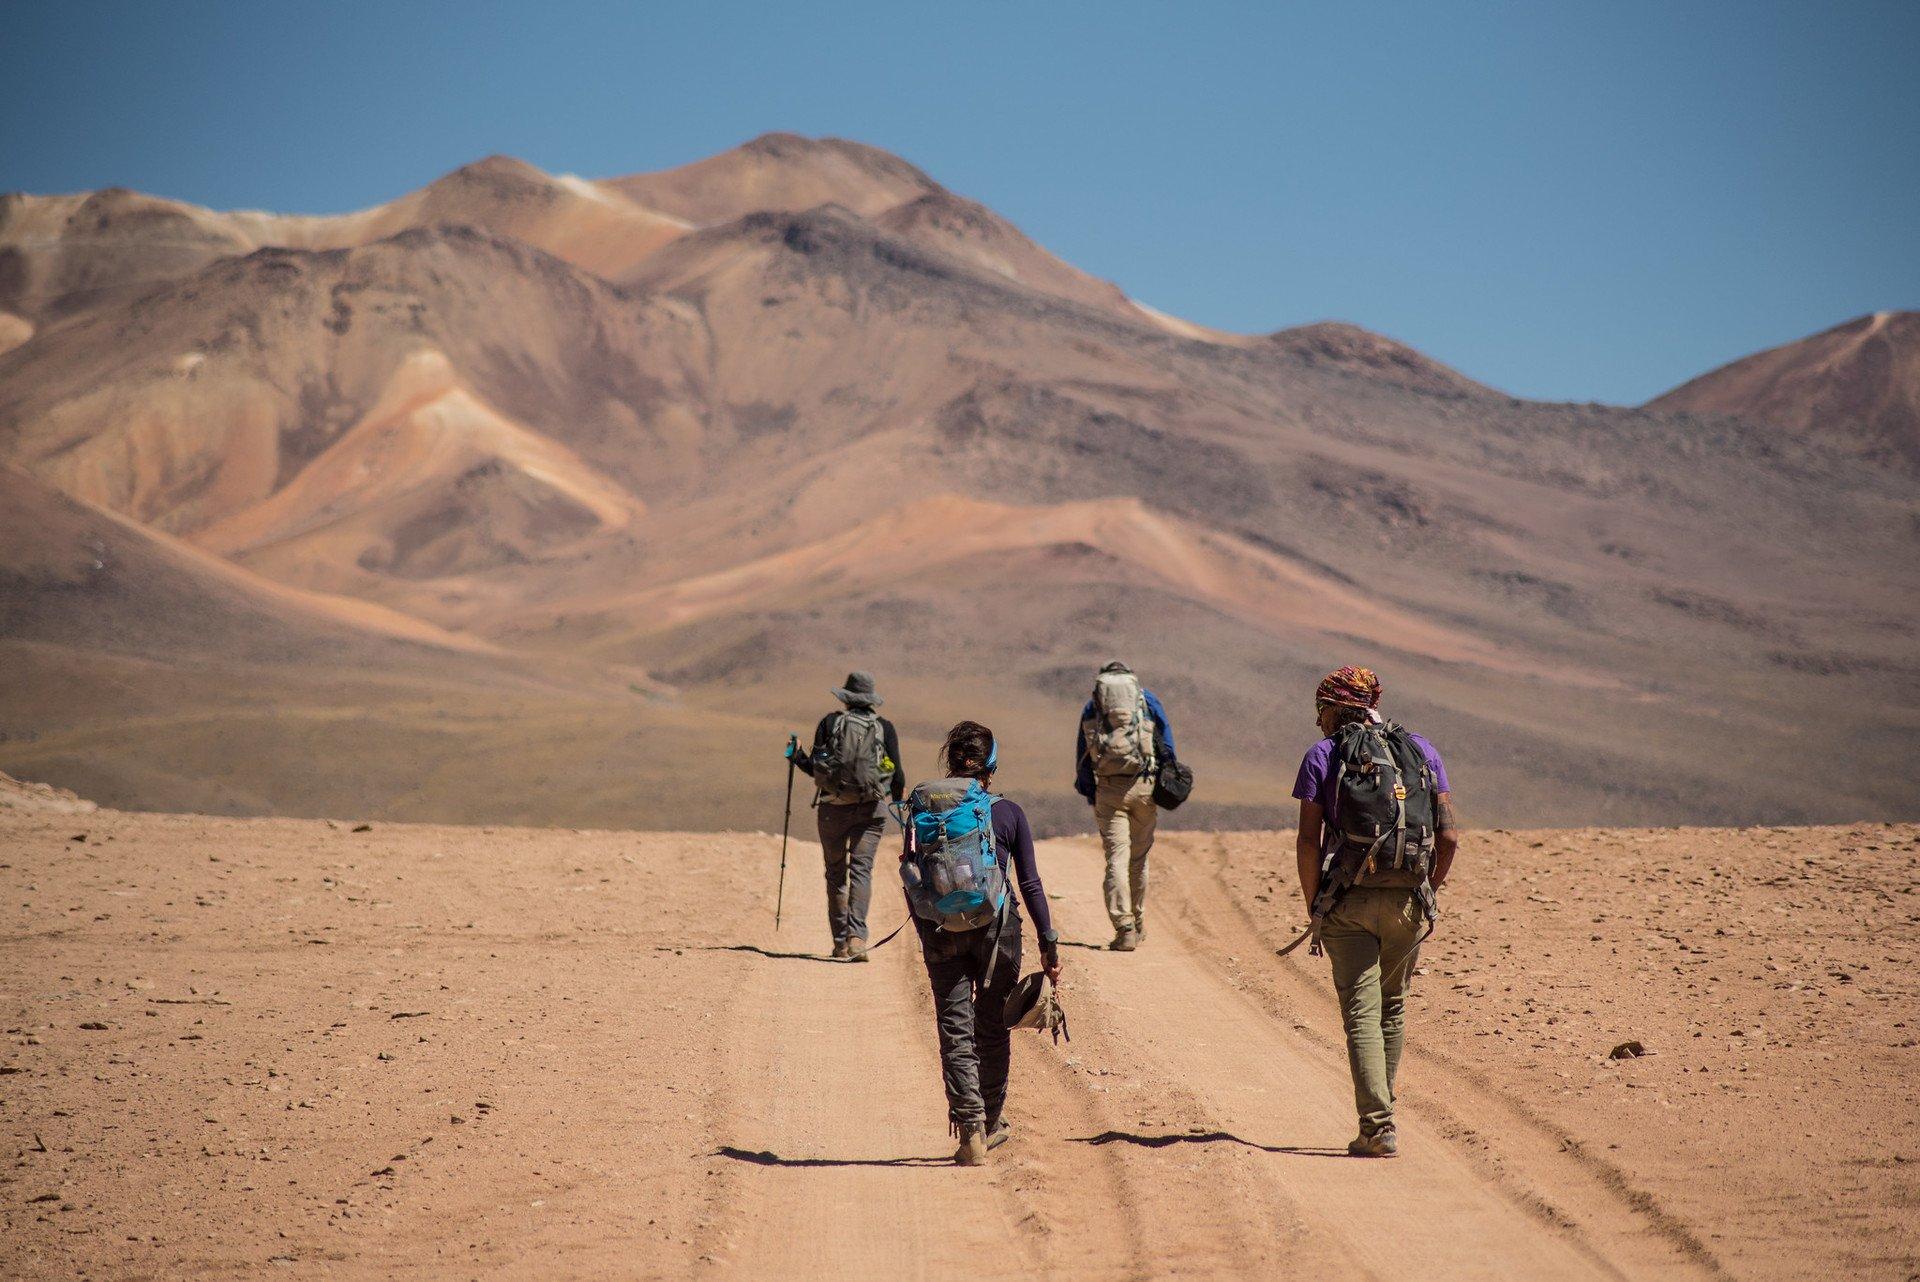 Hiking in the Atacama Desert in Chile